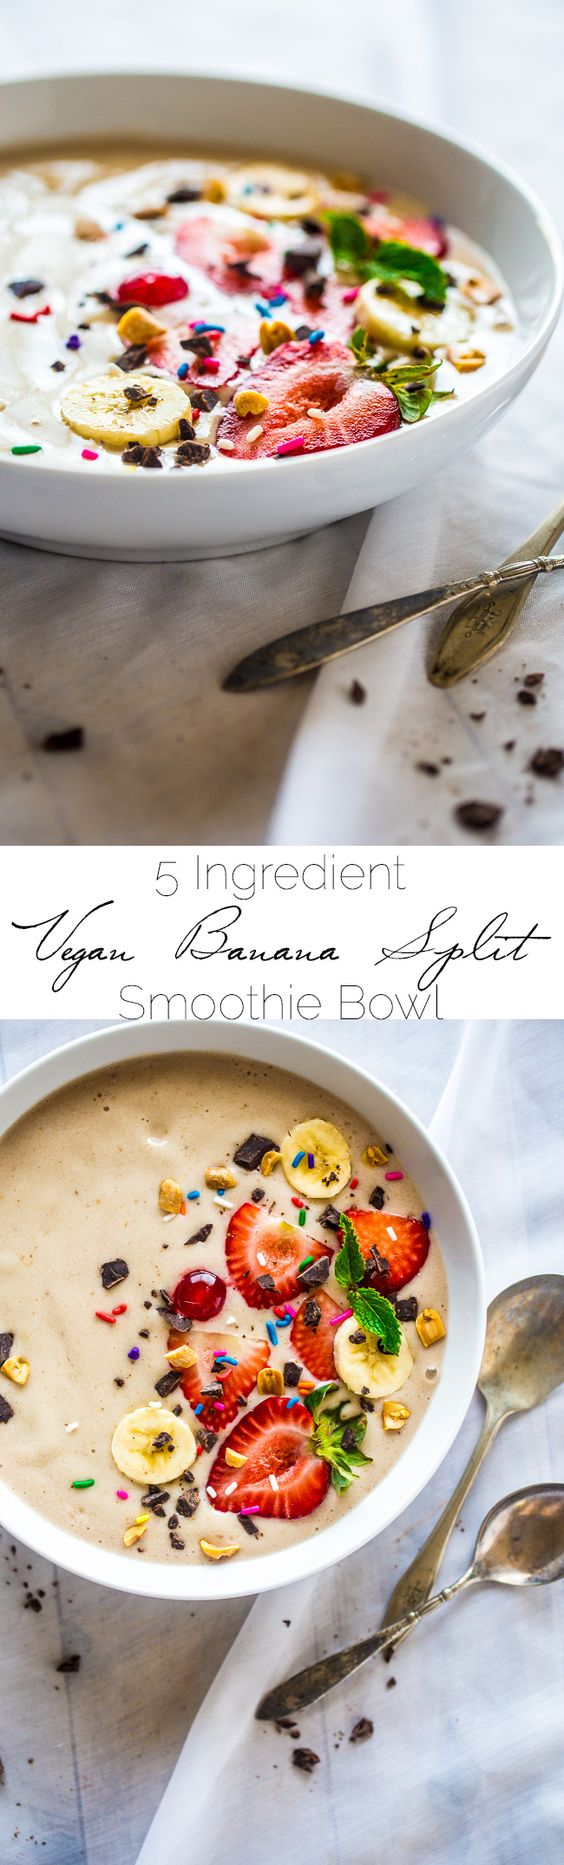 vegan banana split smoothie bowl - paleo, gluten free